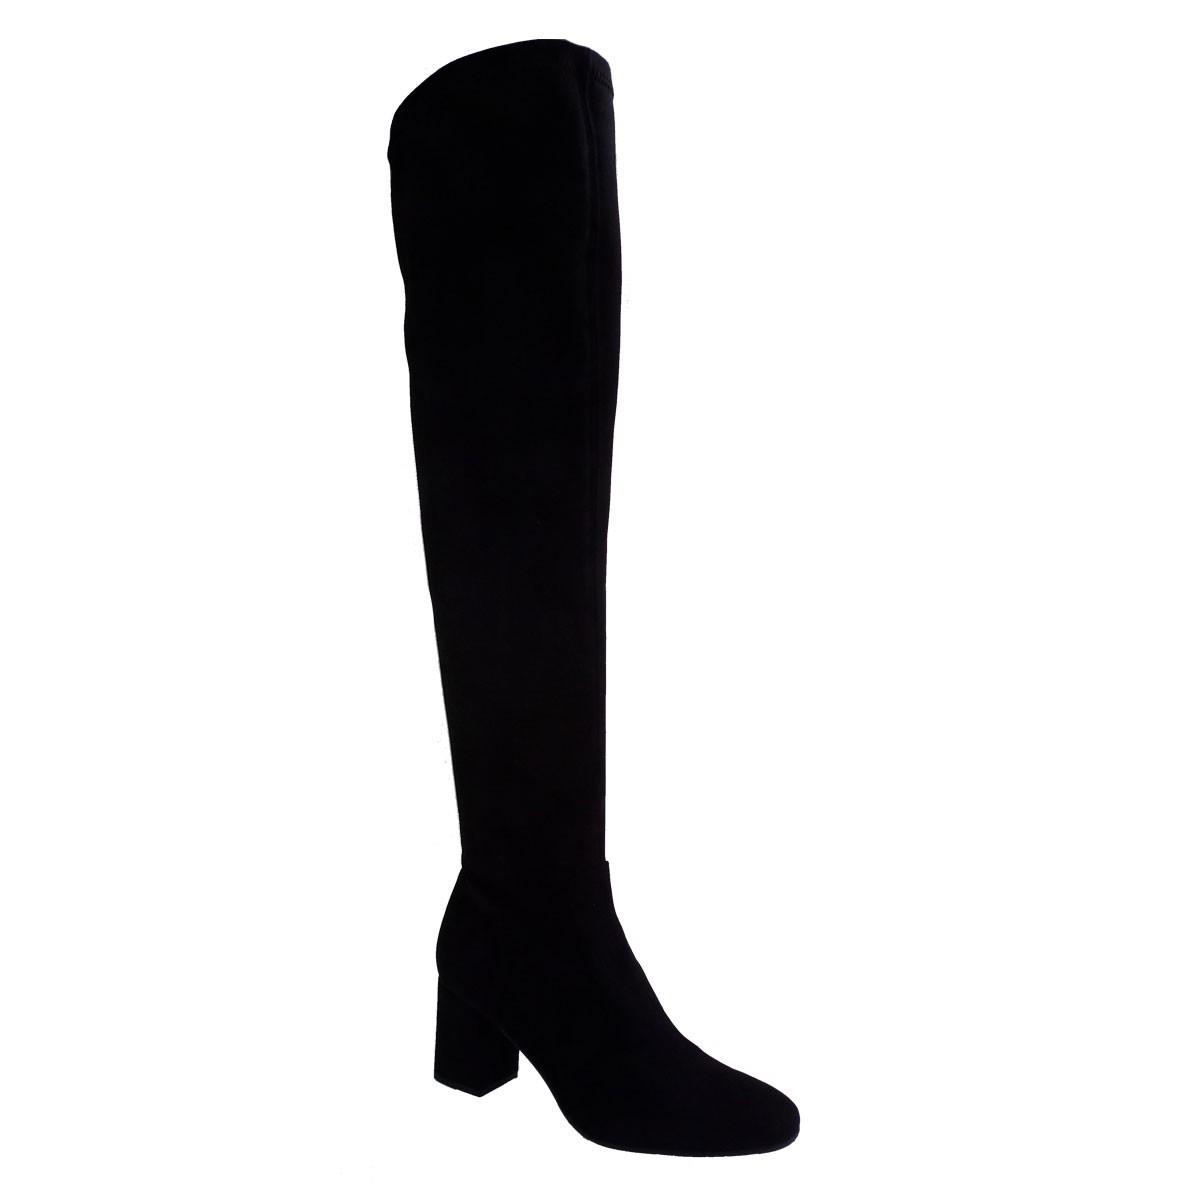 Moods Shoes Γυναικείες Μπότες 3064 Μαύρο Καστόρι